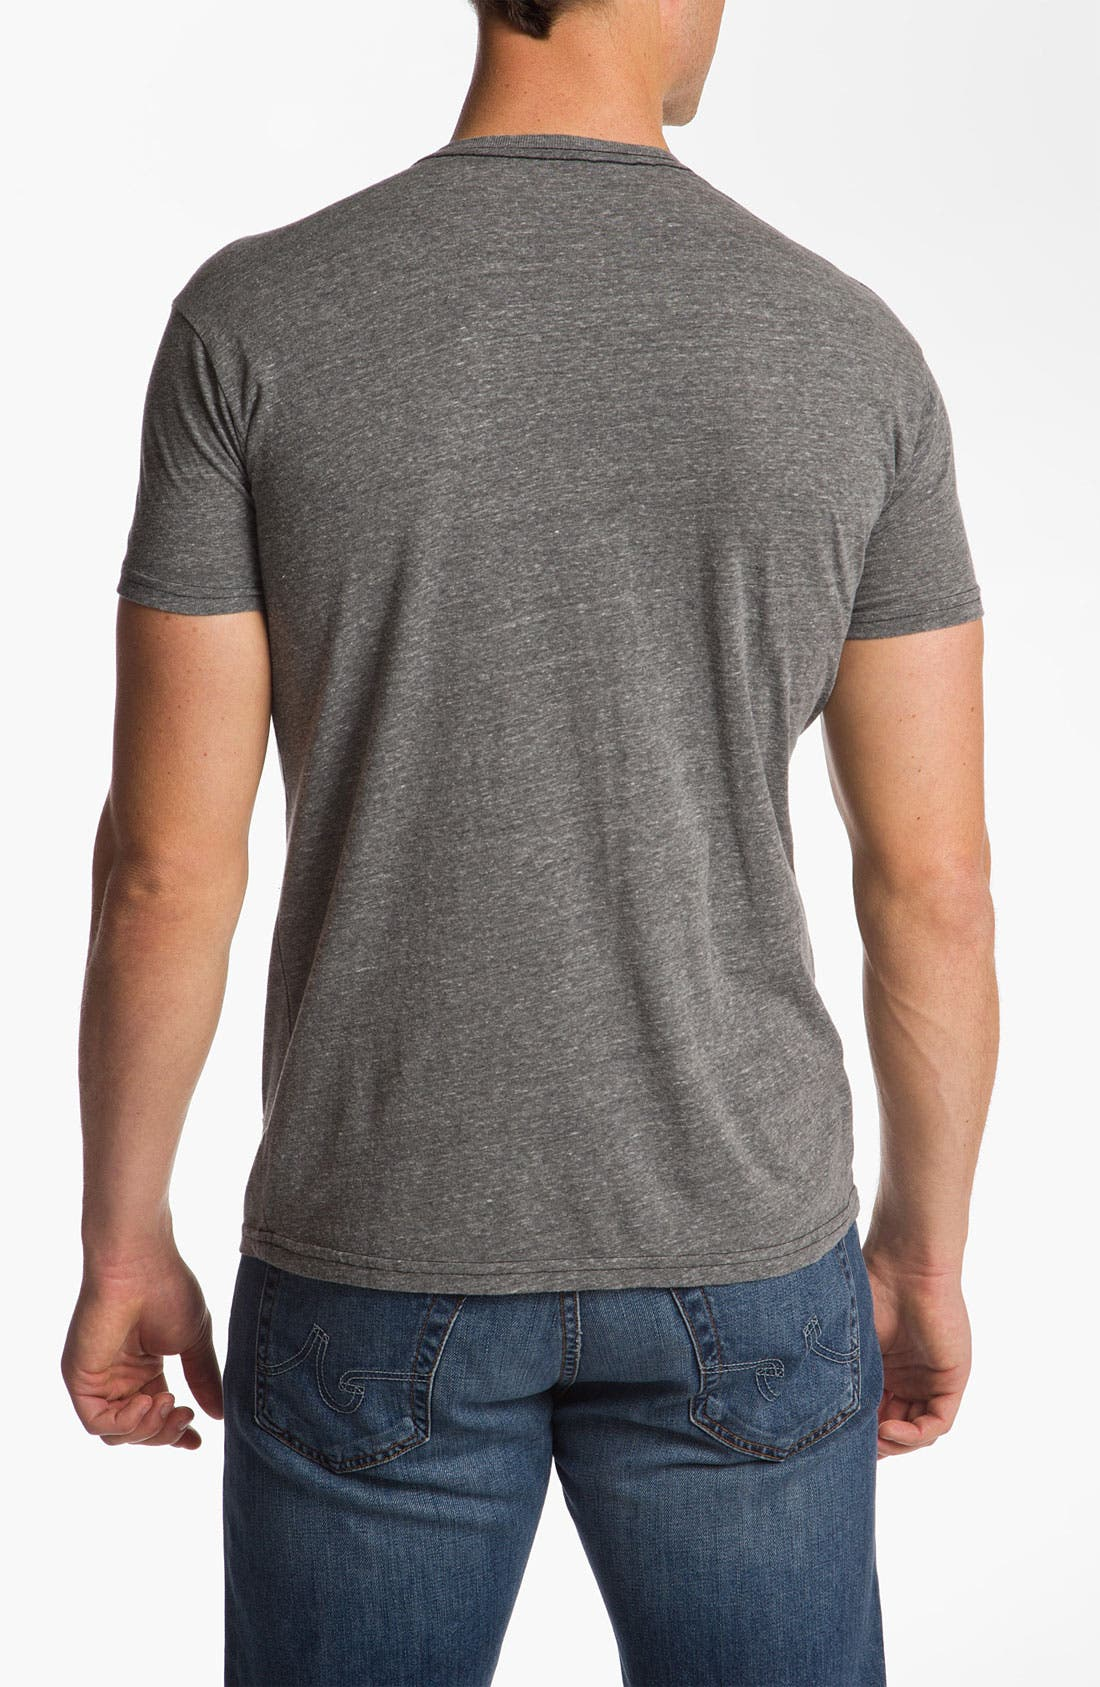 Alternate Image 2  - The Original Retro Brand 'Oregon Ducks - Stitch' T-Shirt